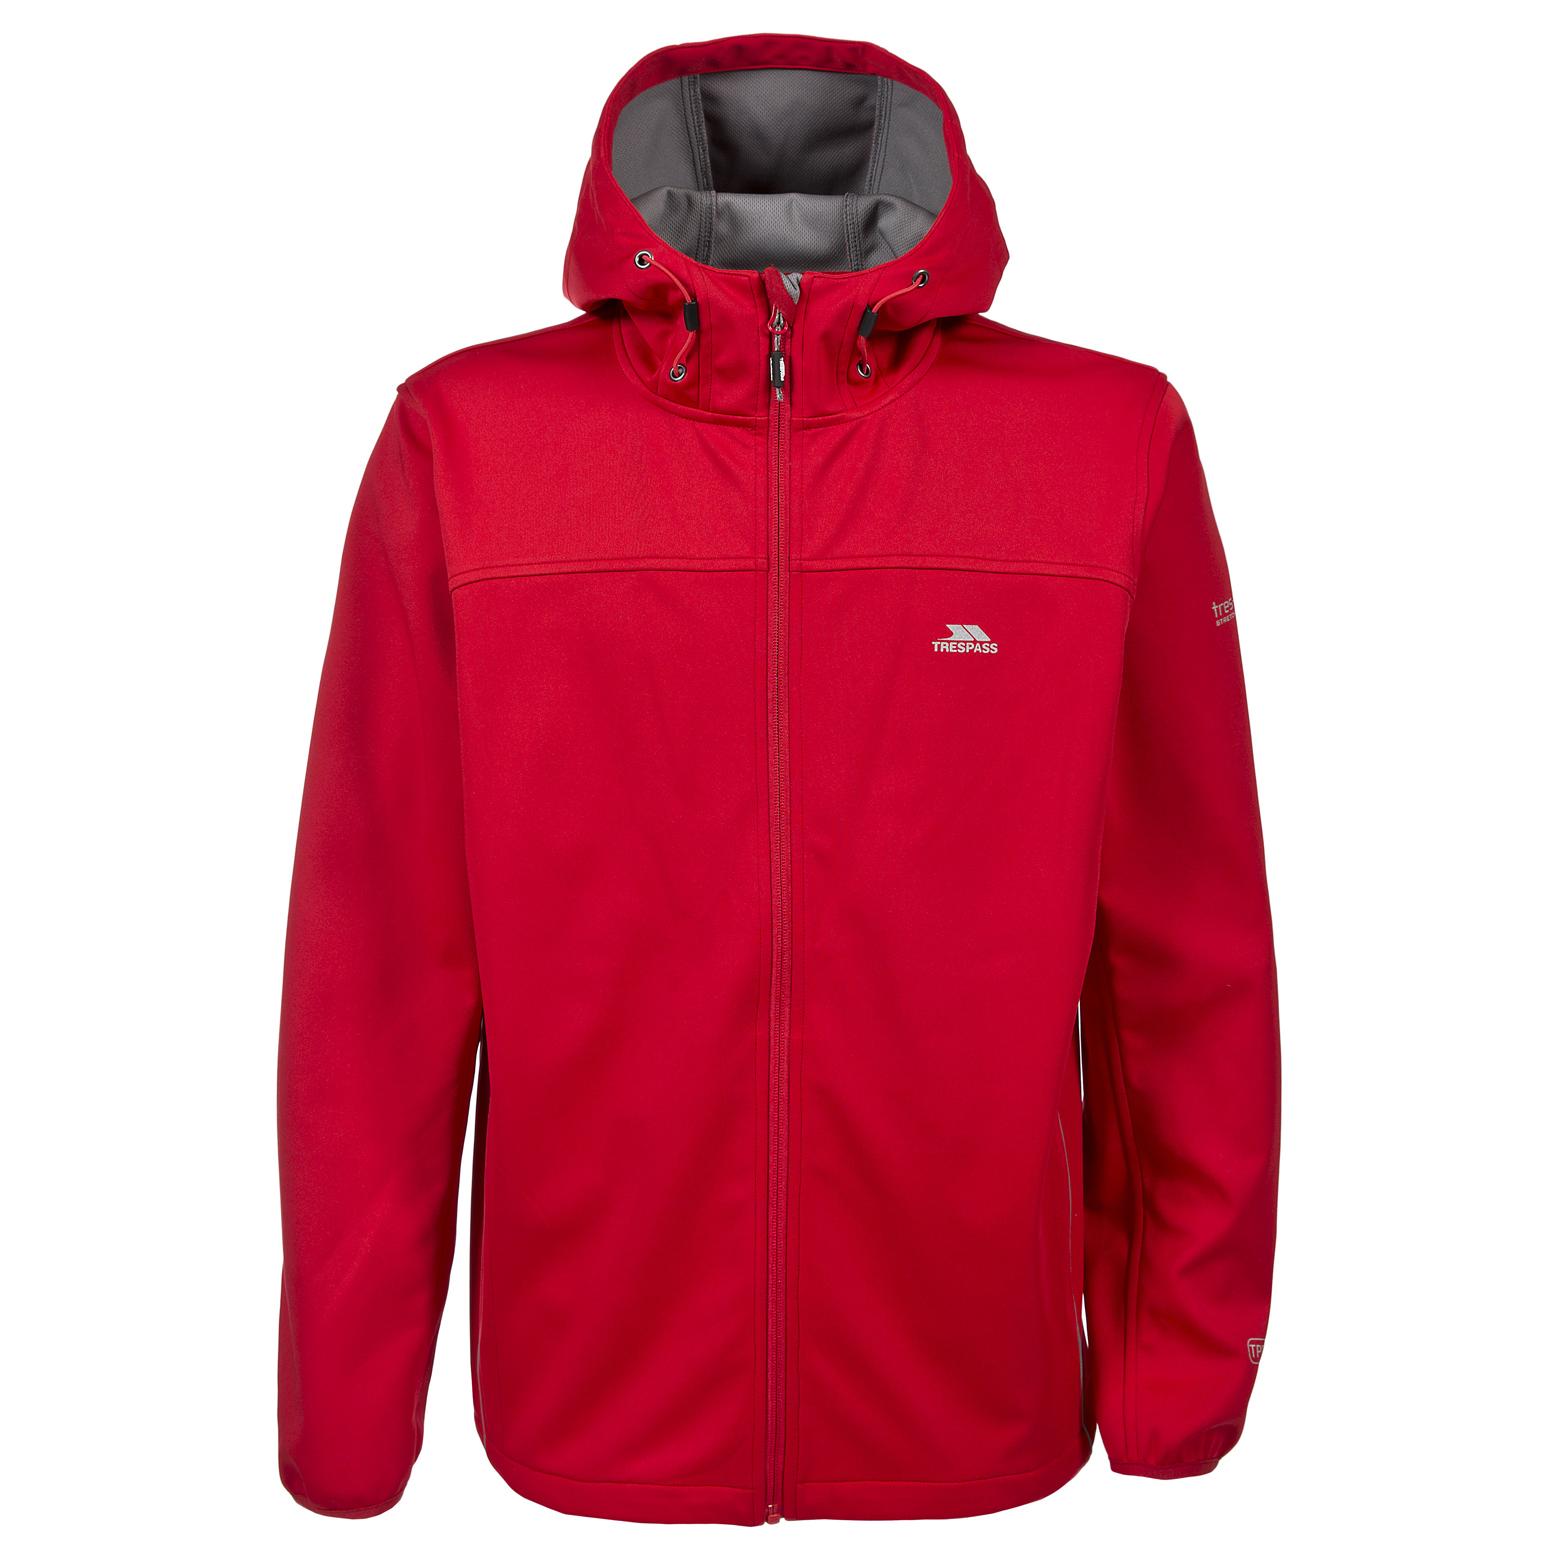 Trespass-Zeek-Para-Hombre-Impermeable-Transpirable-Abrigo-chaqueta-de-cascara-suave-con-capucha miniatura 19